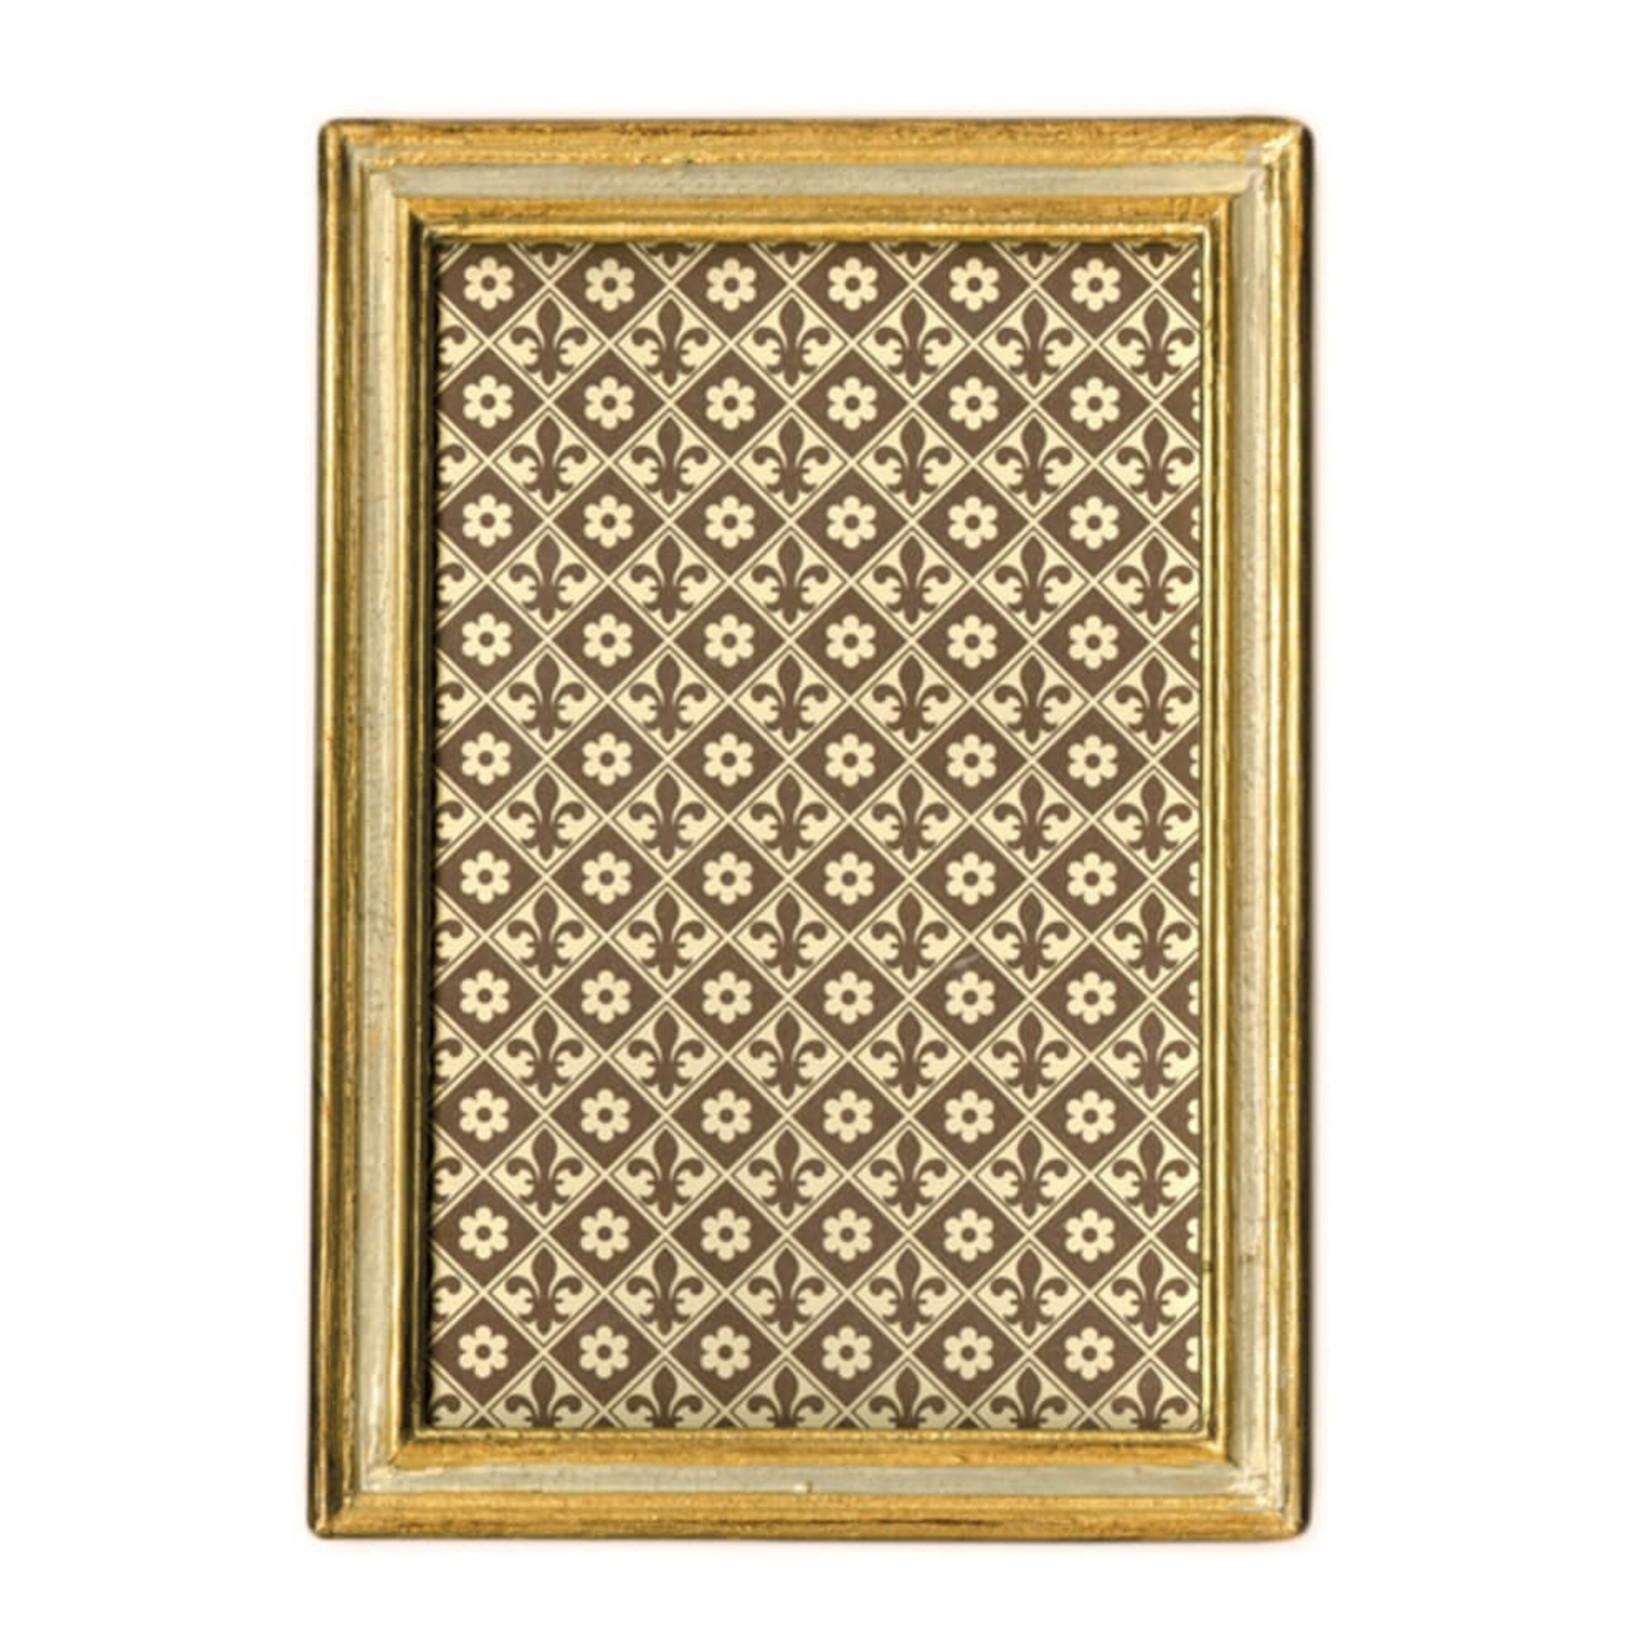 Cavallini & Co. Urbino Creme Frame